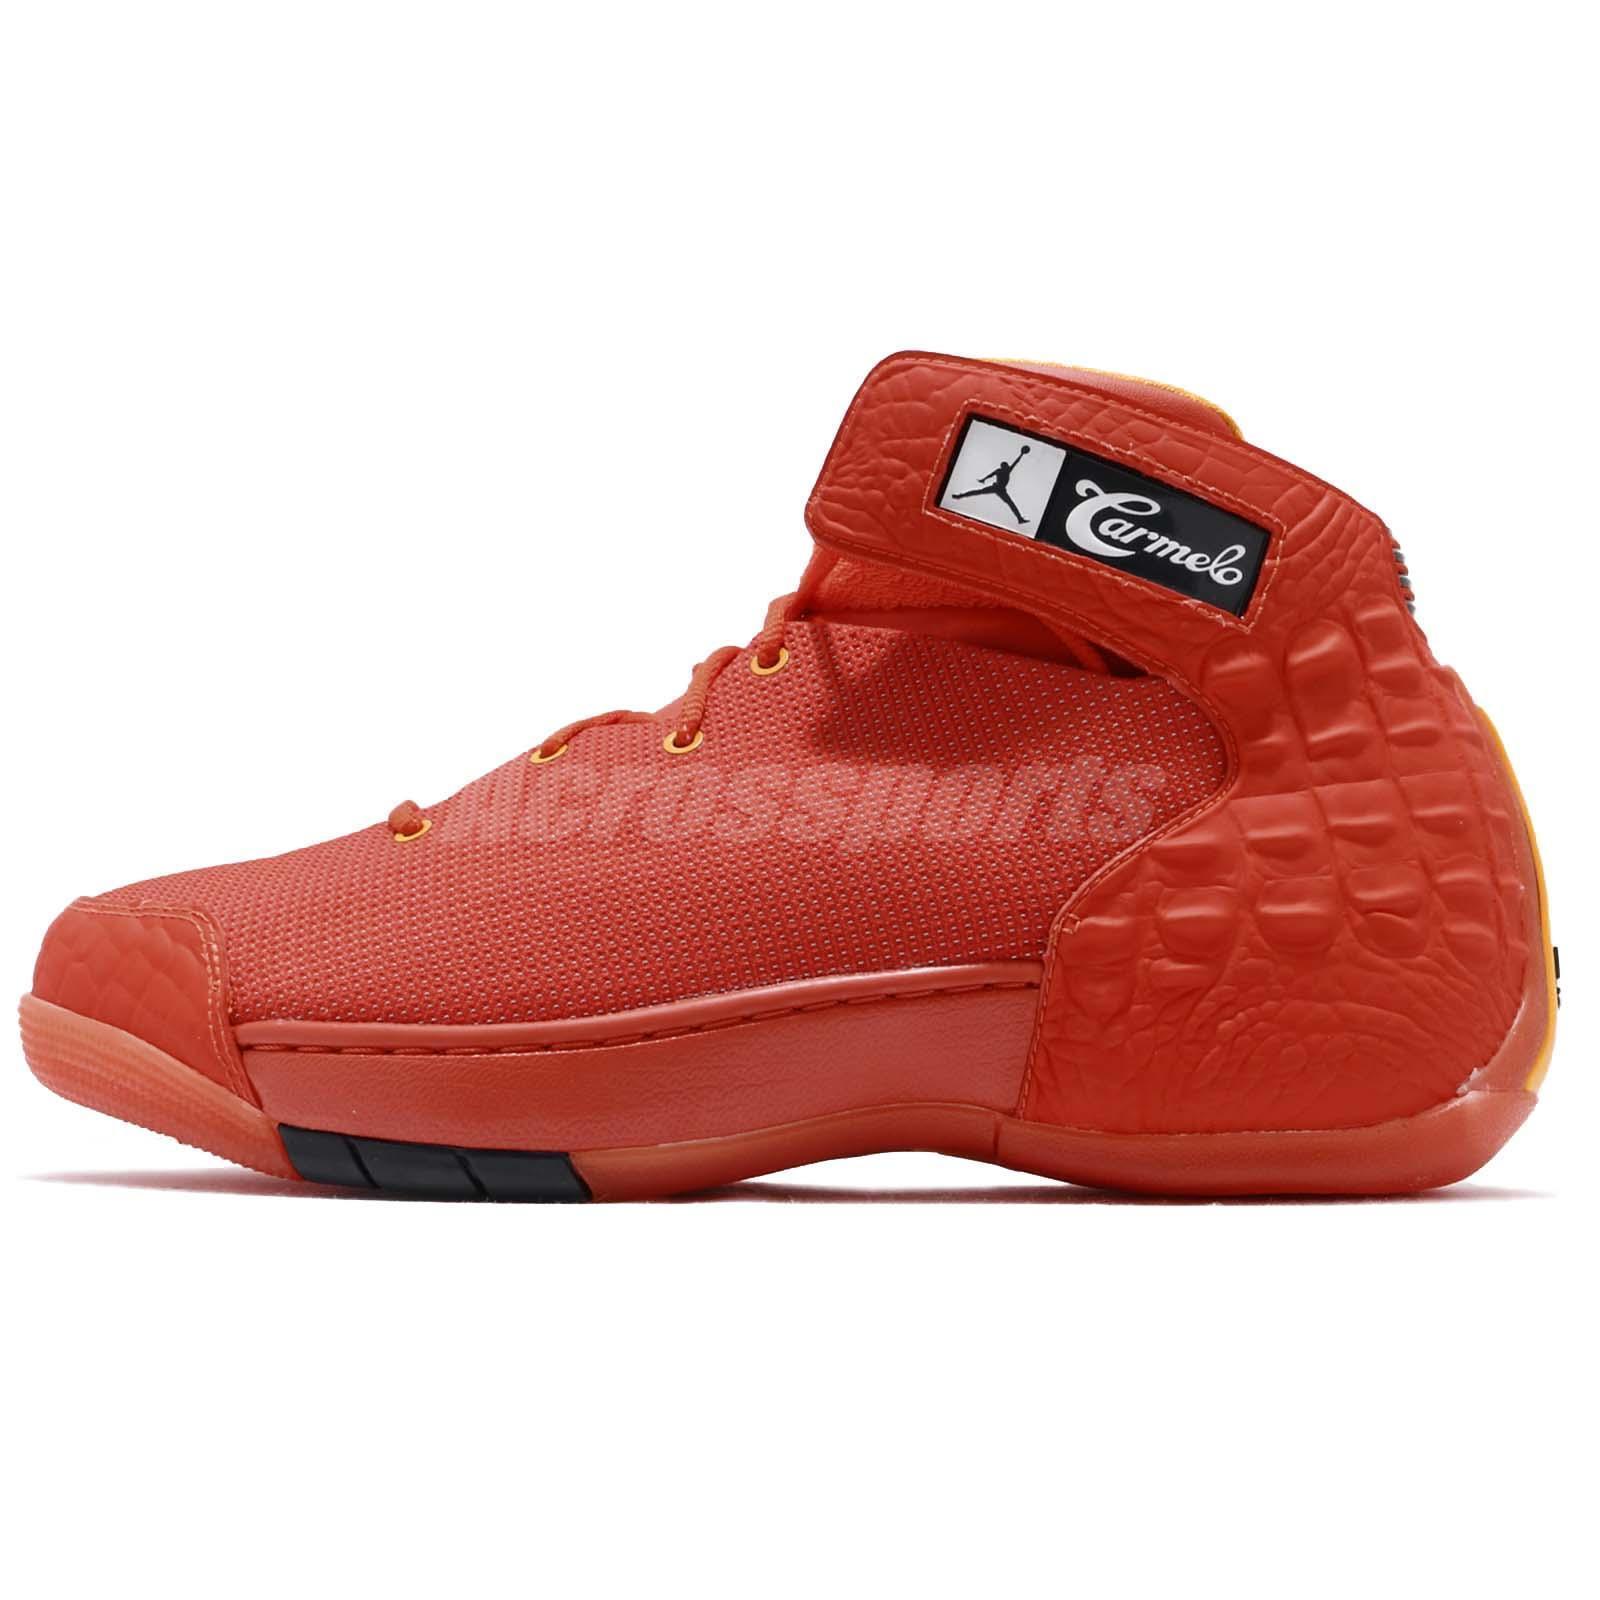 680d5c72614e ... hoodie melo OKC 1 · Jordan Brand   Kicks On Court ...